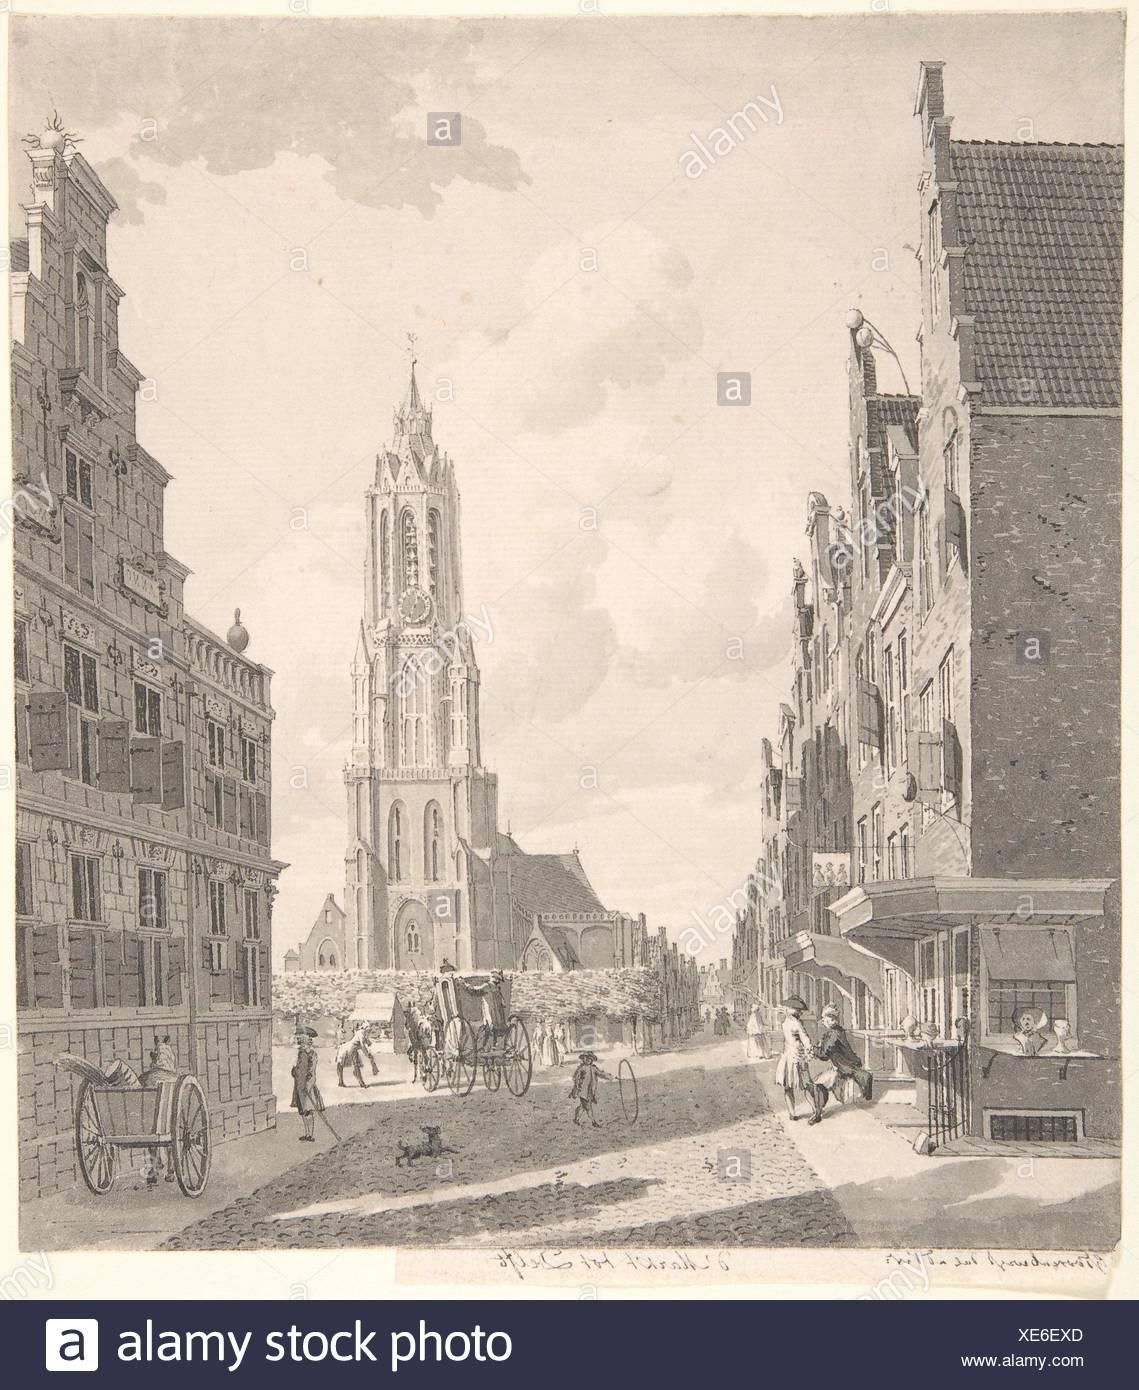 Marketplace of Delft with the Nieuwekerk. Artist: Gerrit Toorenburgh (Dutch, Amsterdam 1732-1785 Nijerk); Date: 18th century; Medium: Pen and gray Stock Photo